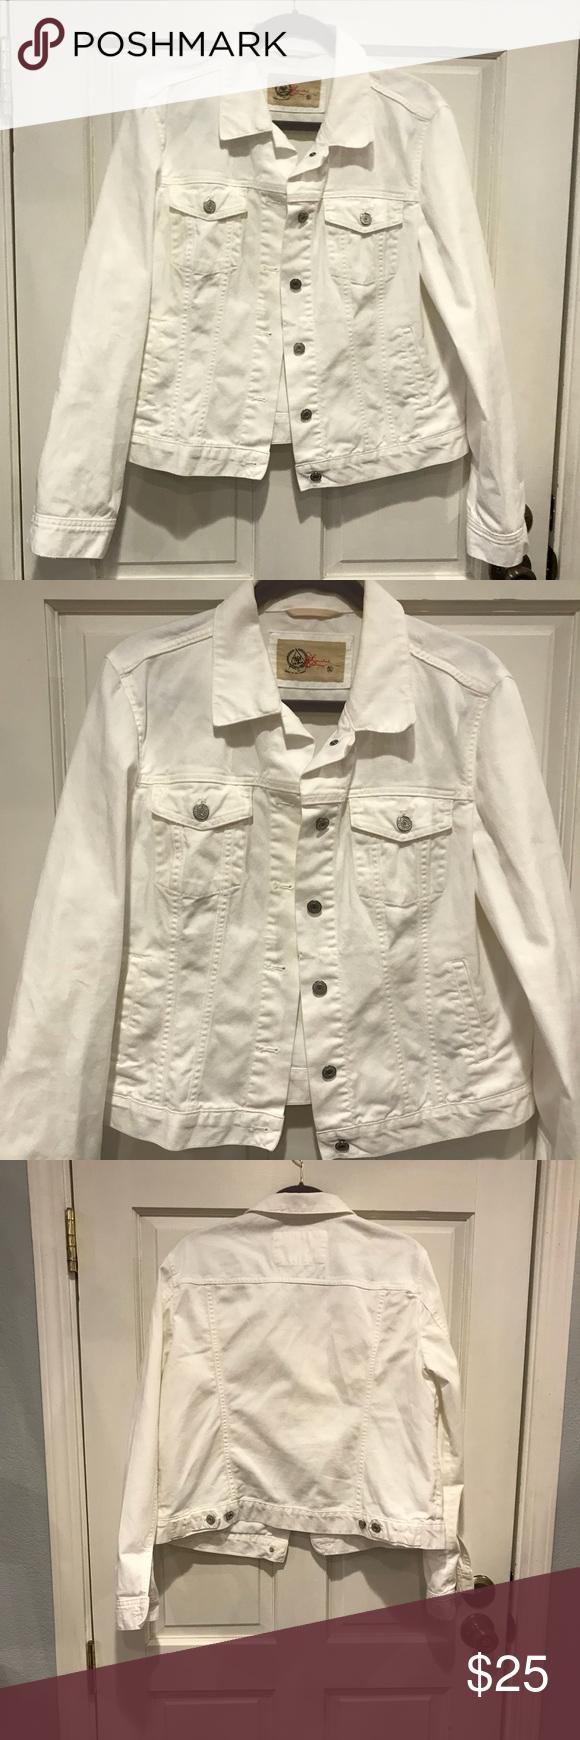 Gap 1969 Xl Limited Edition White Denim Jacket White Denim Jacket White Denim Jackets [ 1740 x 580 Pixel ]